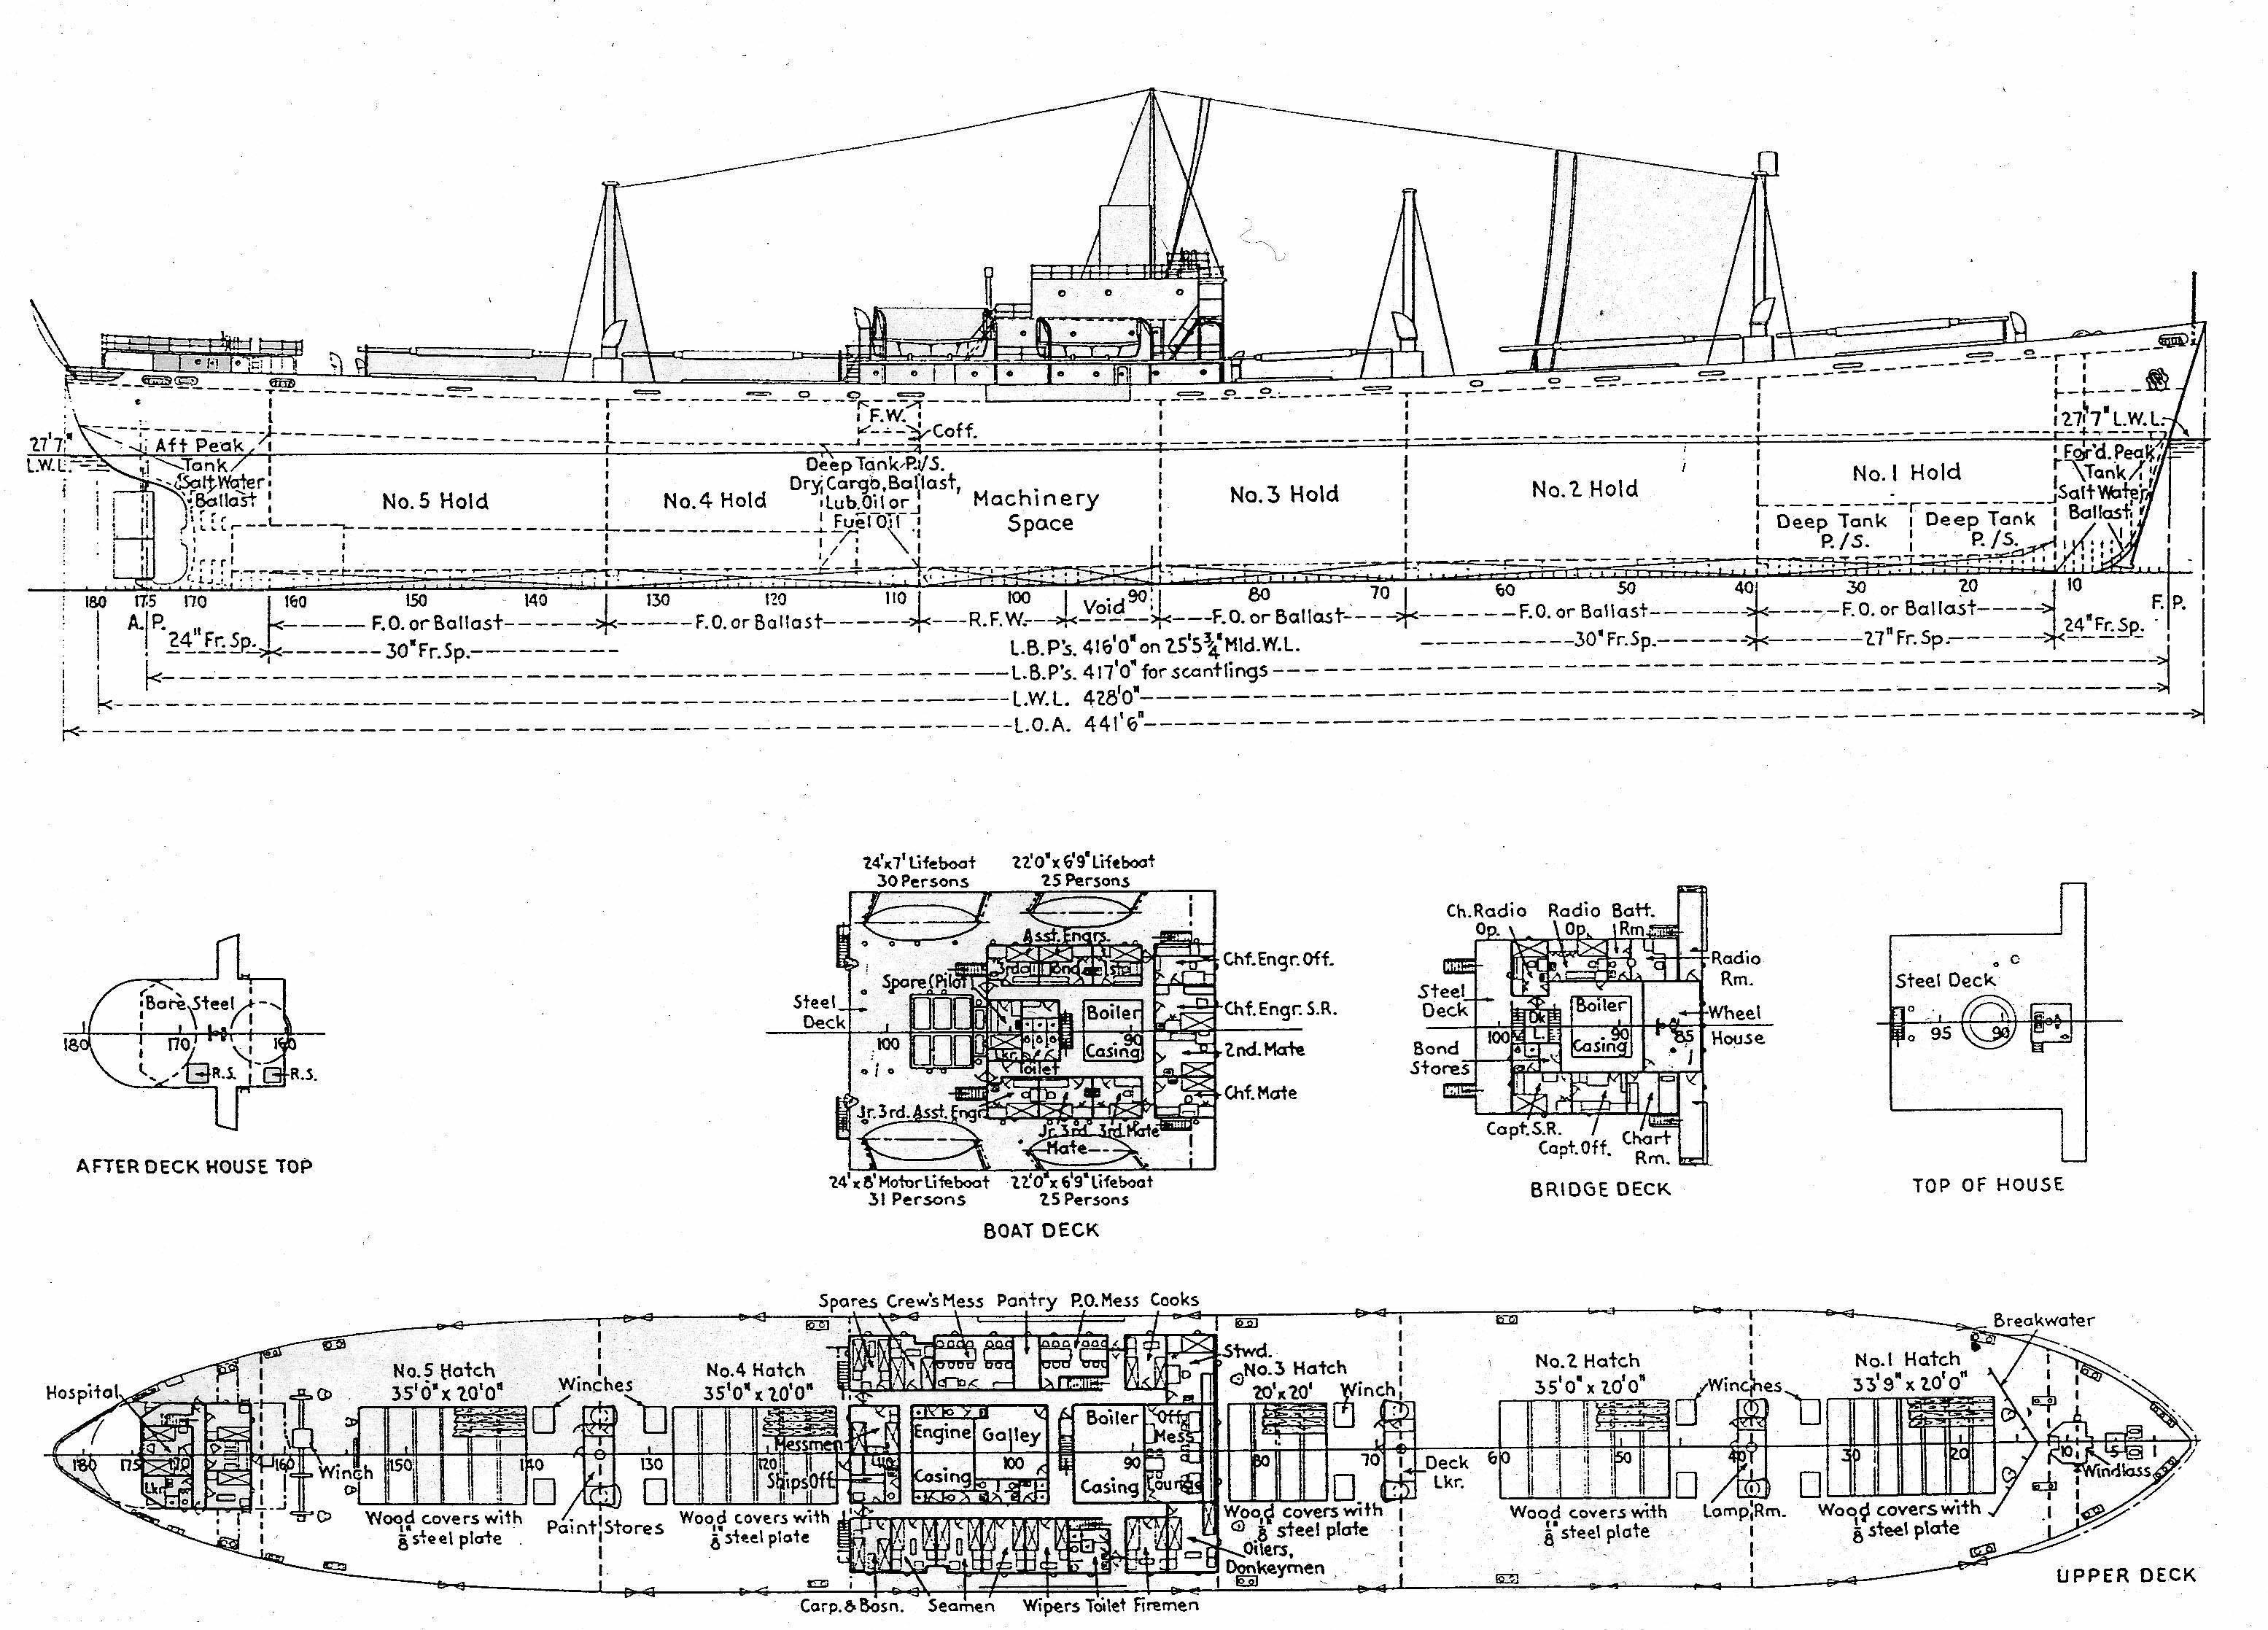 liberty ship diagram steamships ocean going 1900 1943. Black Bedroom Furniture Sets. Home Design Ideas